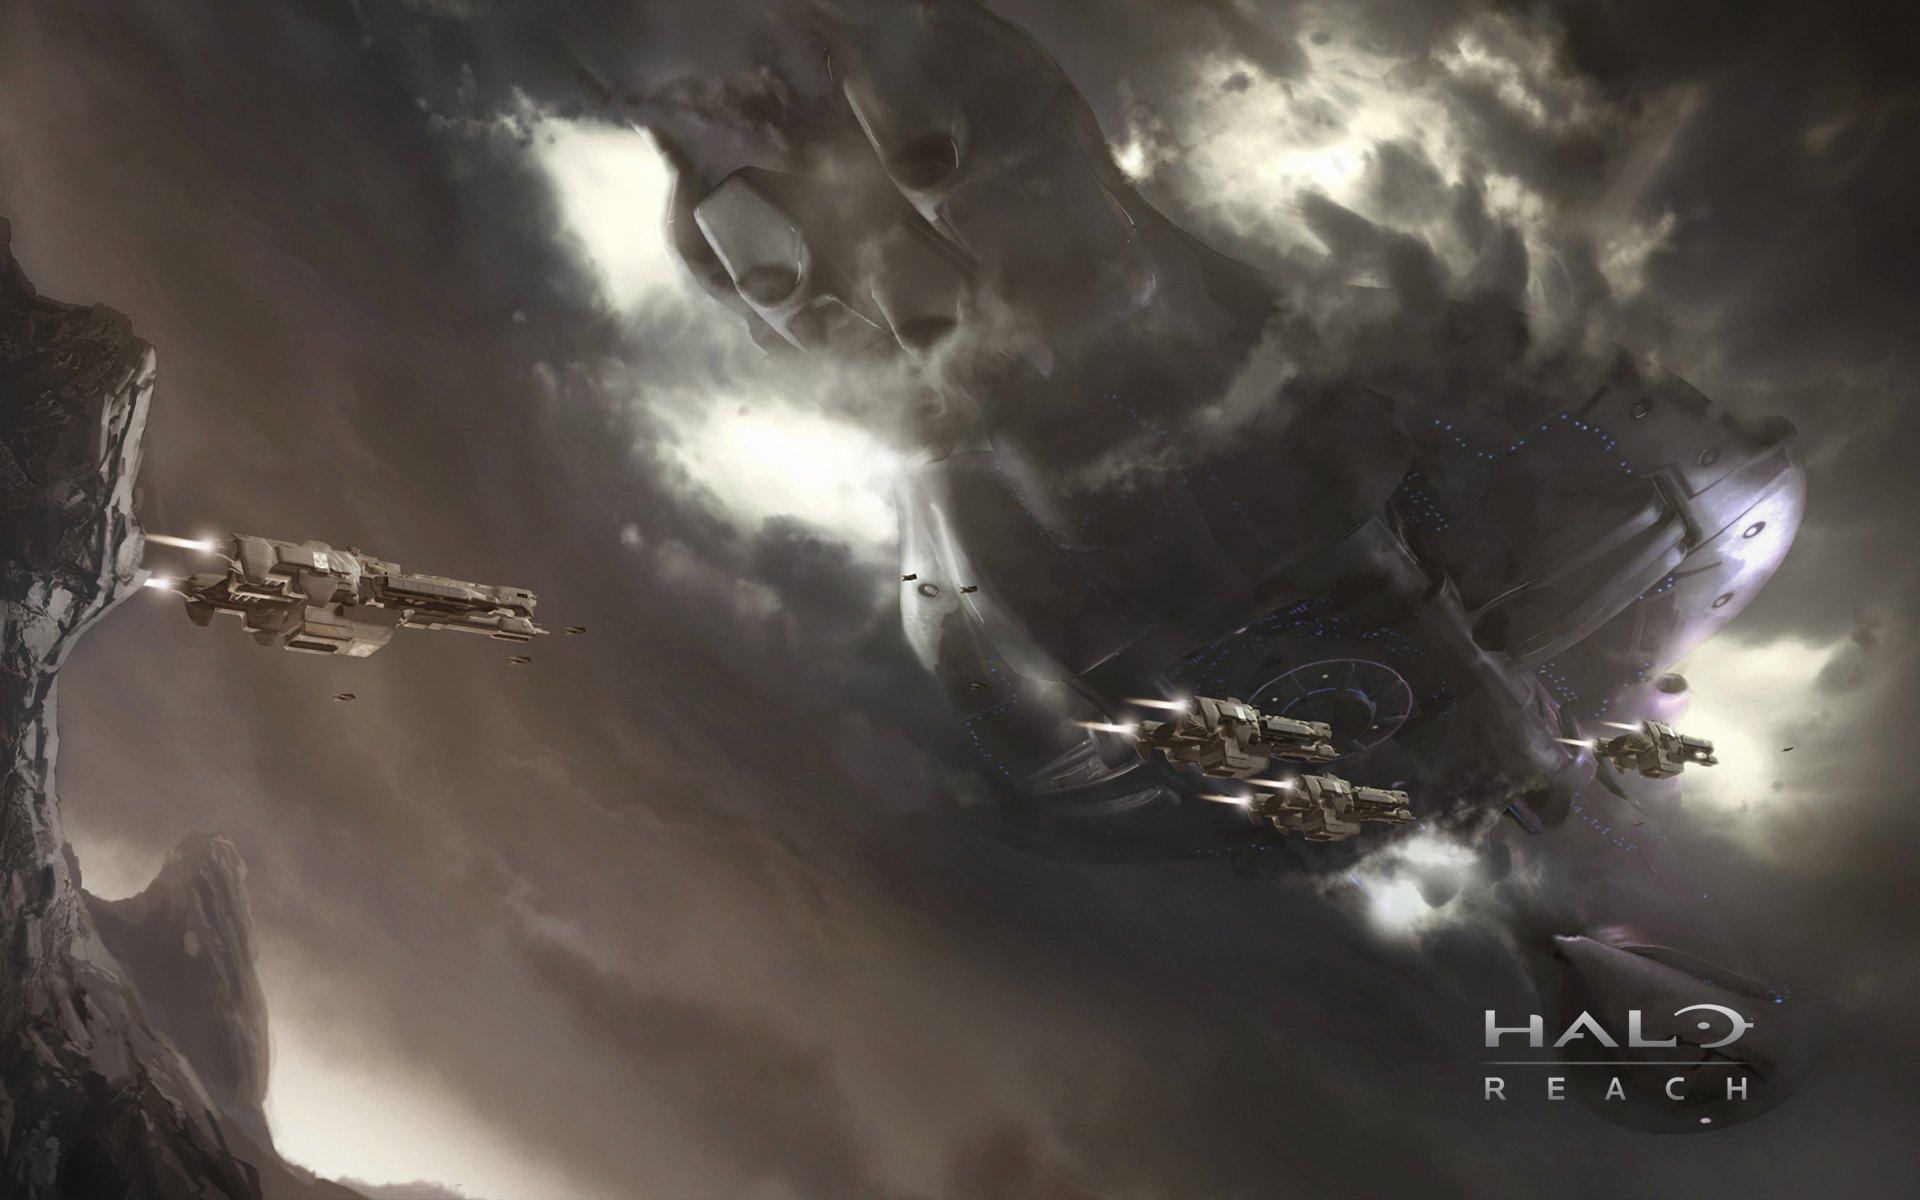 Halo reach wallpaper - SF Wallpaper